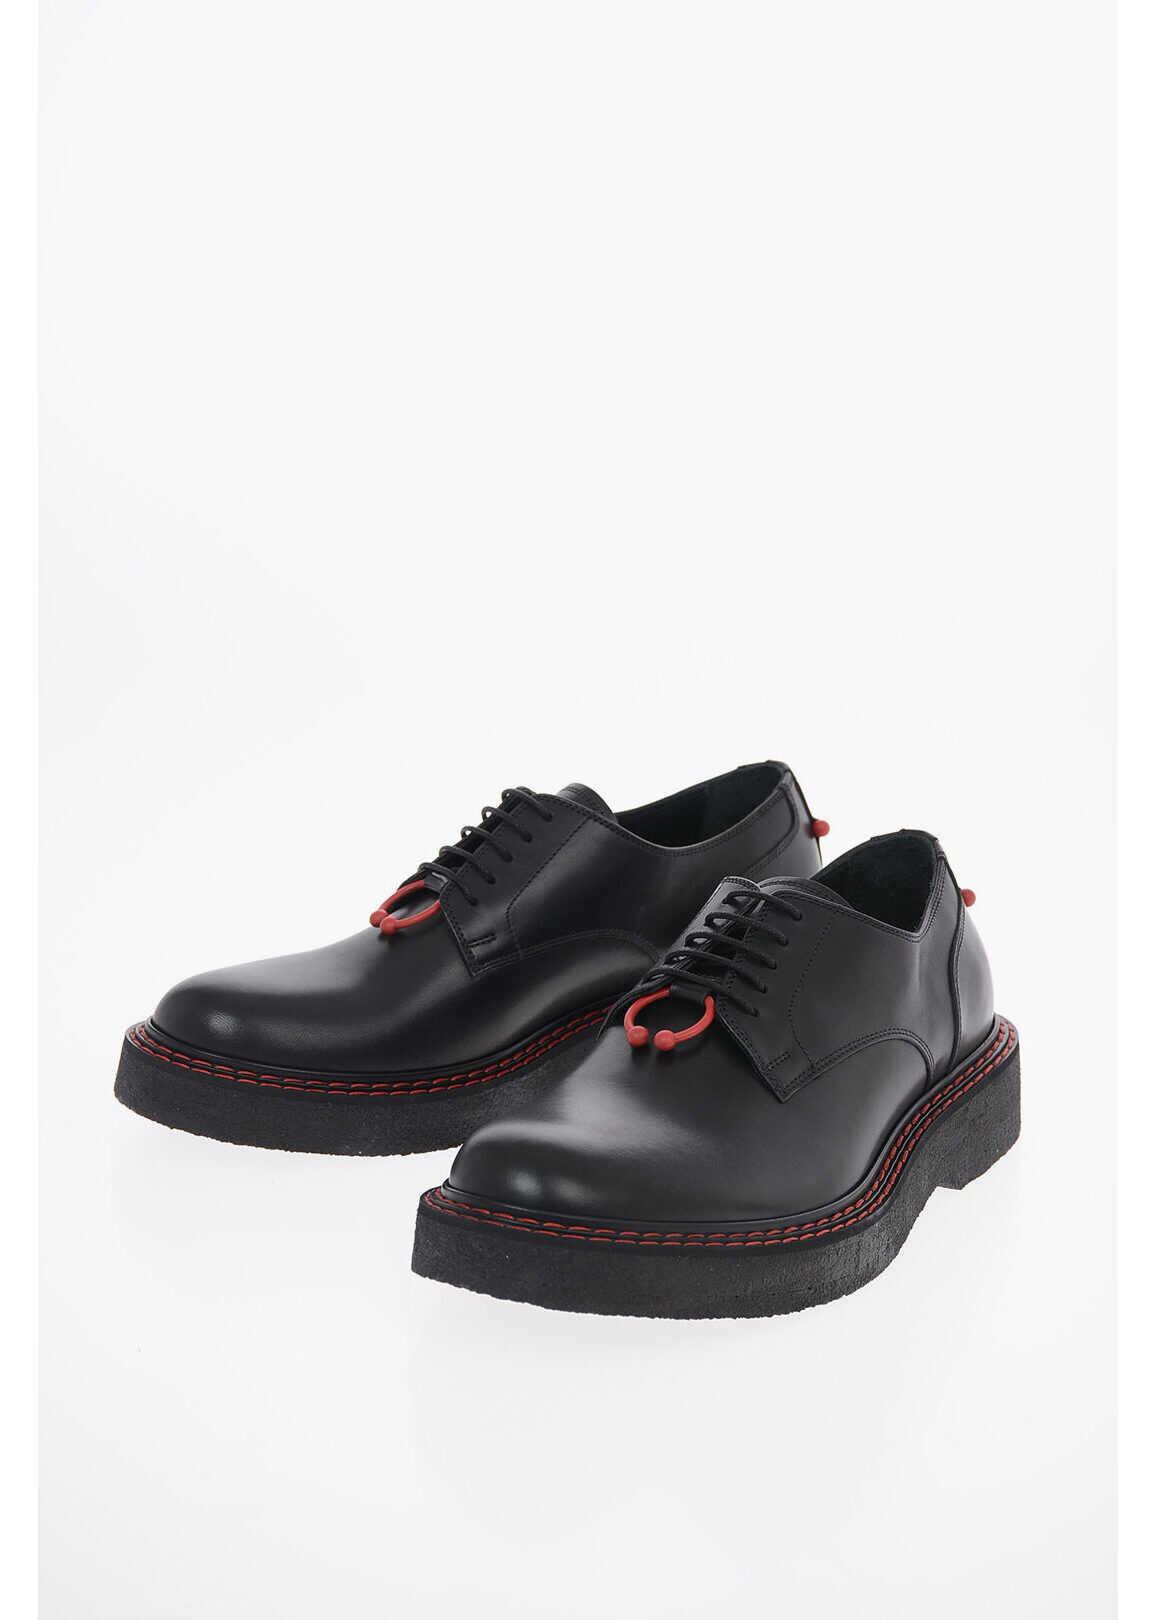 Neil Barrett Leather MONOGRAM PIERCED PUNK Derby Shoes BLACK imagine b-mall.ro